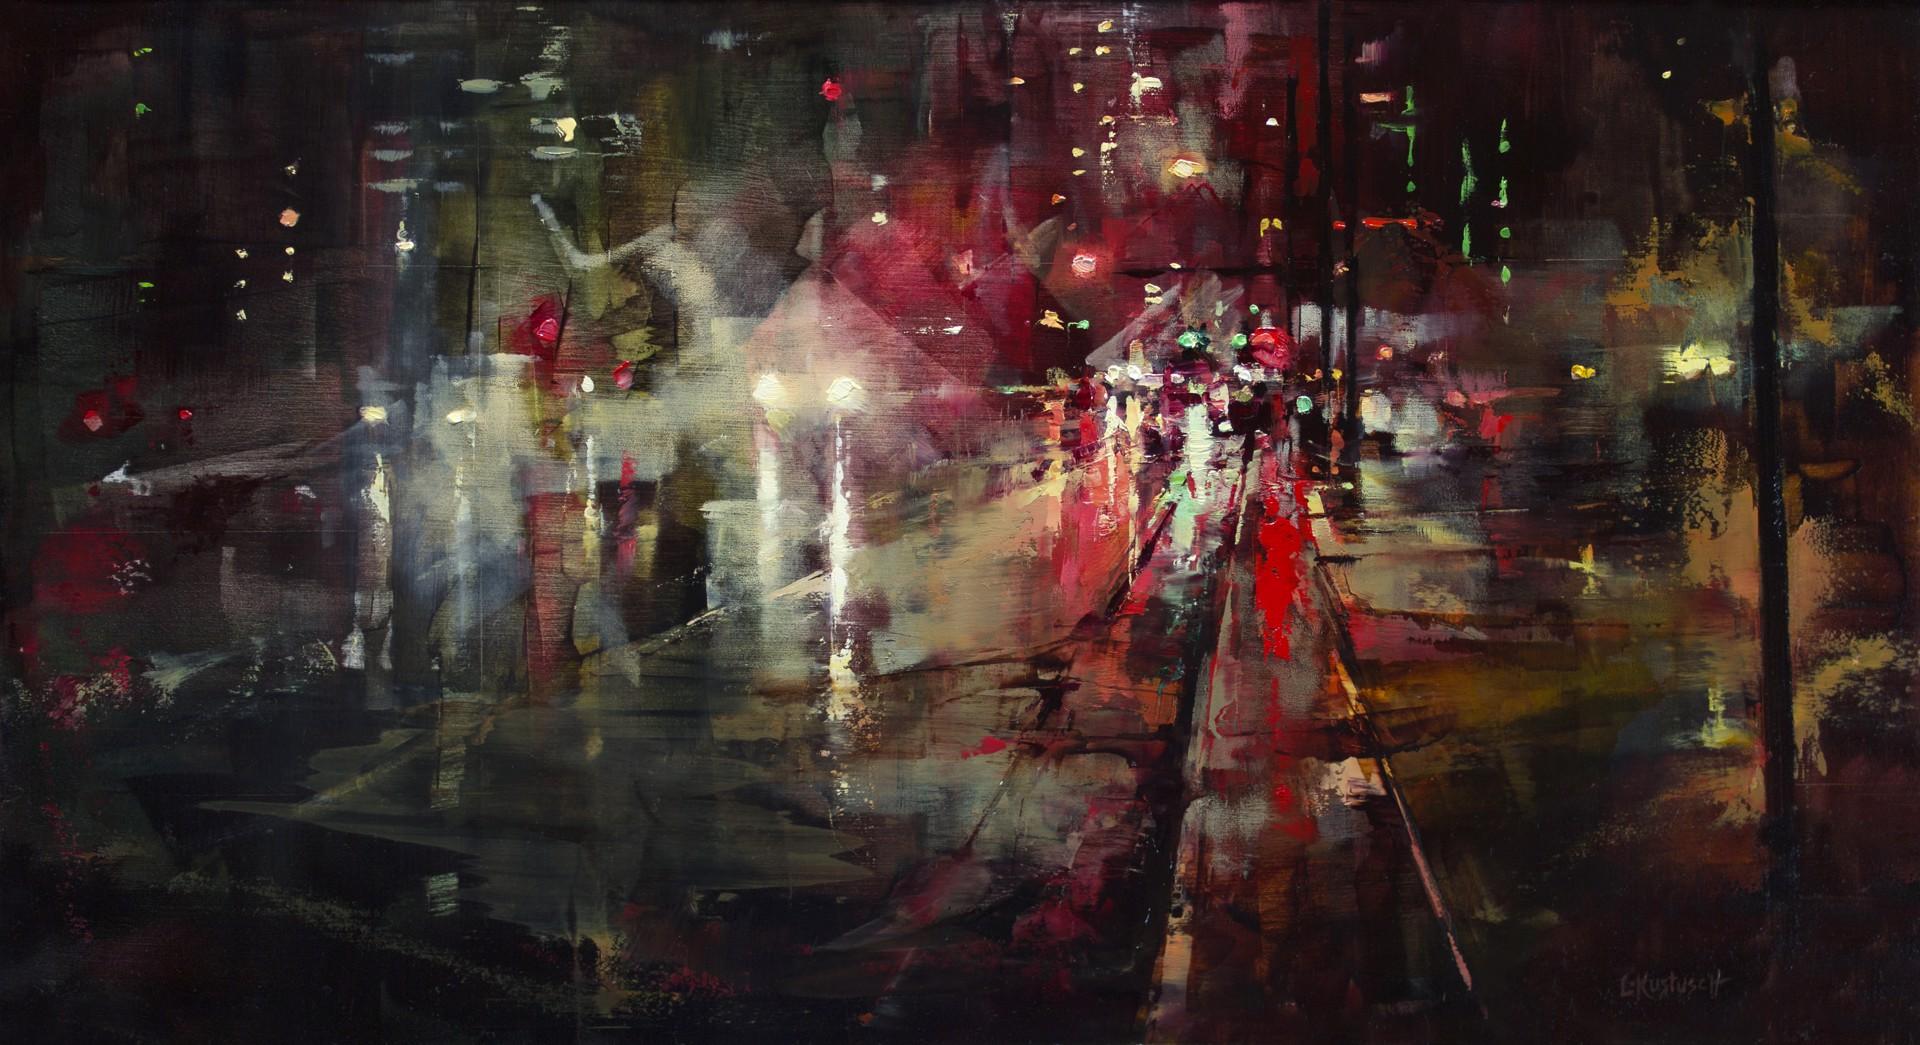 Night Lights by Lindsey Kustusch